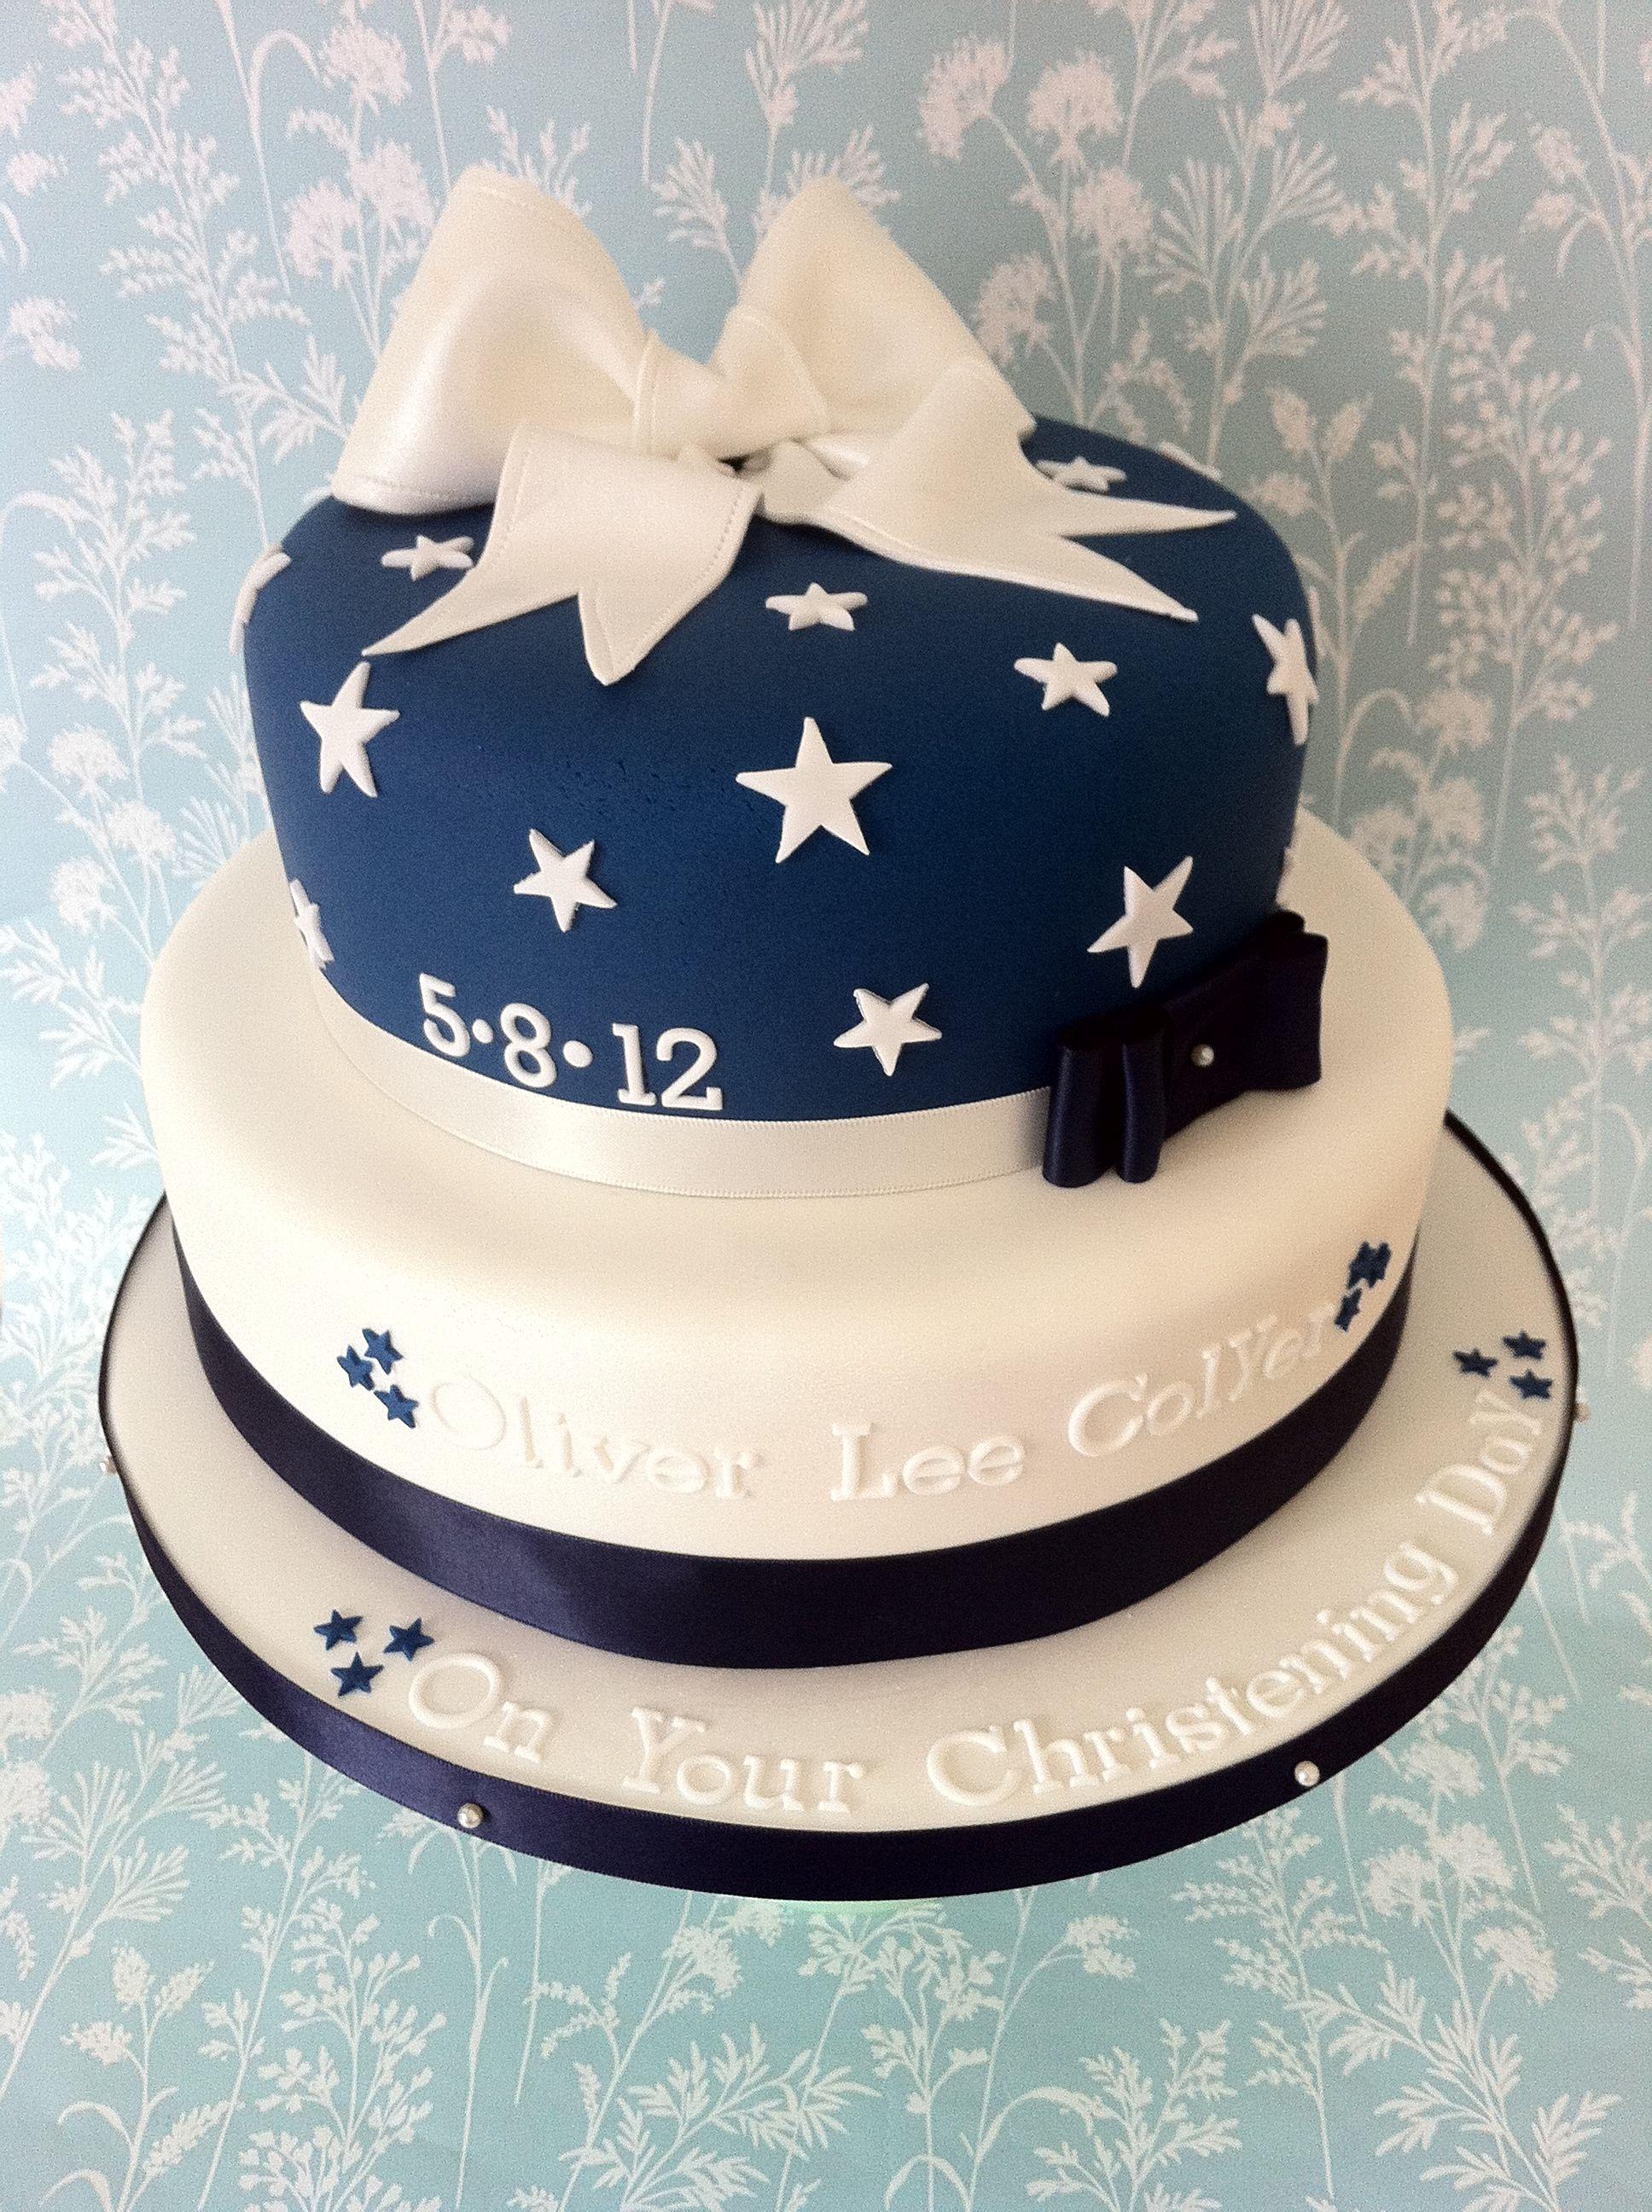 A 2 tier christening cake